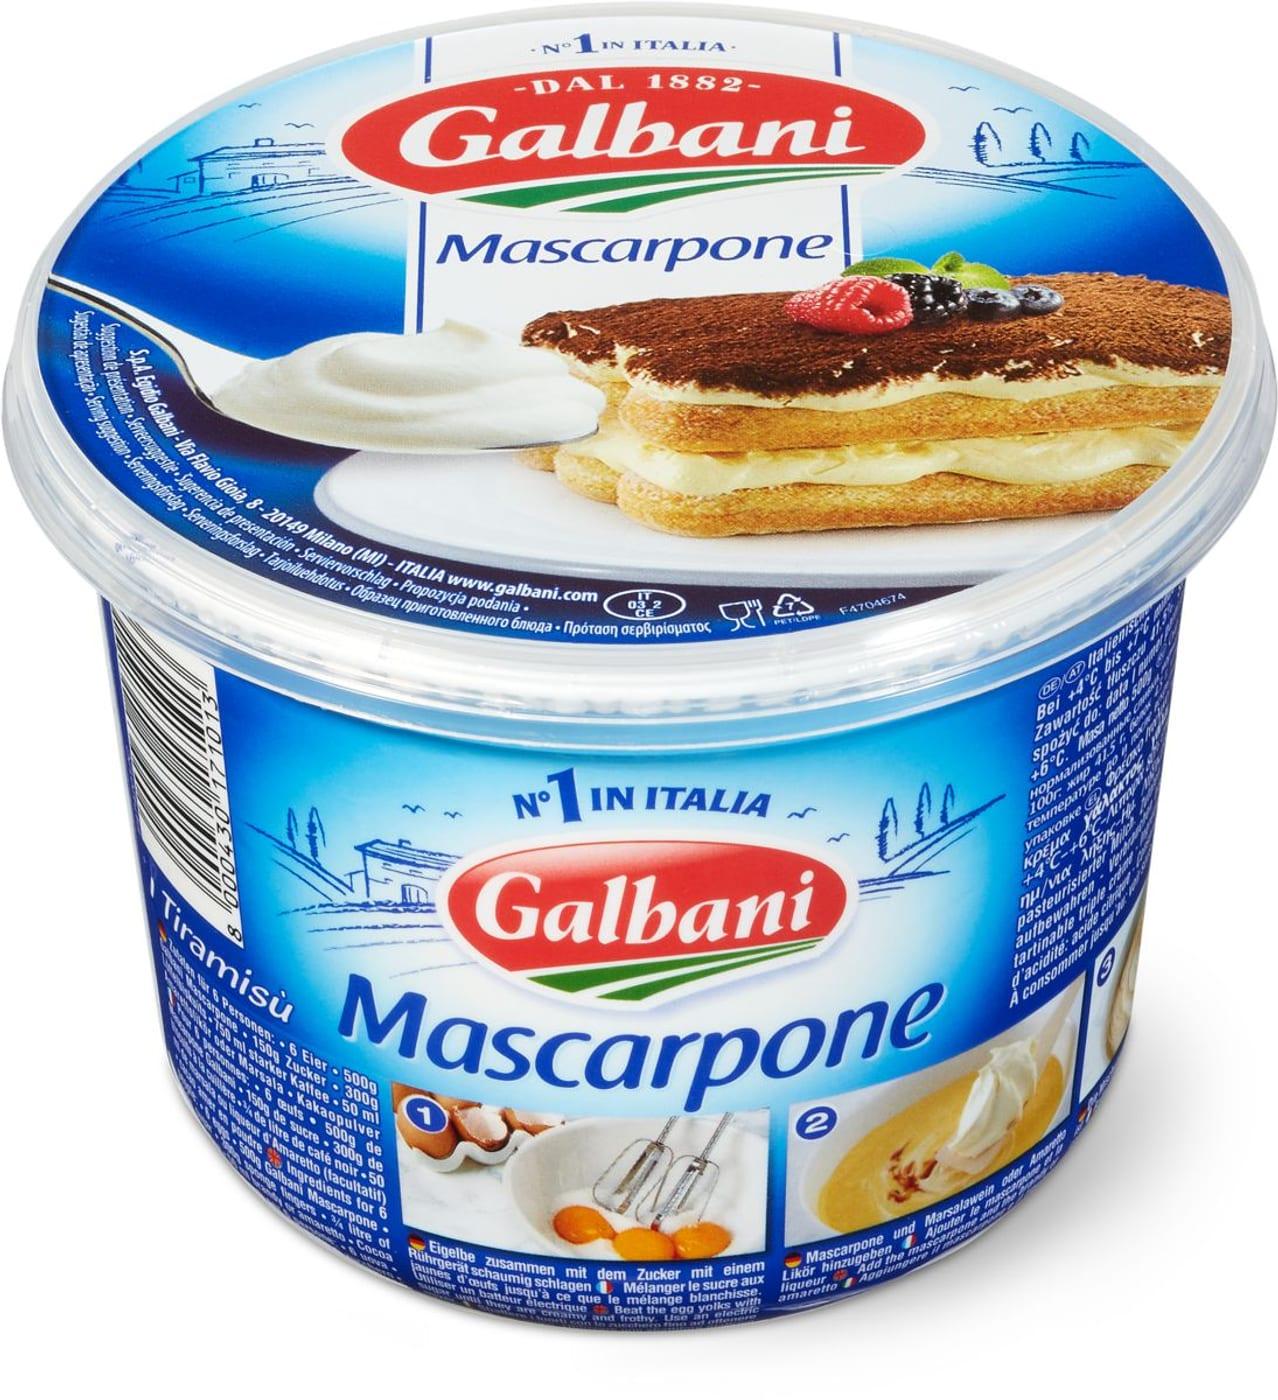 Galbani mascarpone migros for What to do with mascarpone